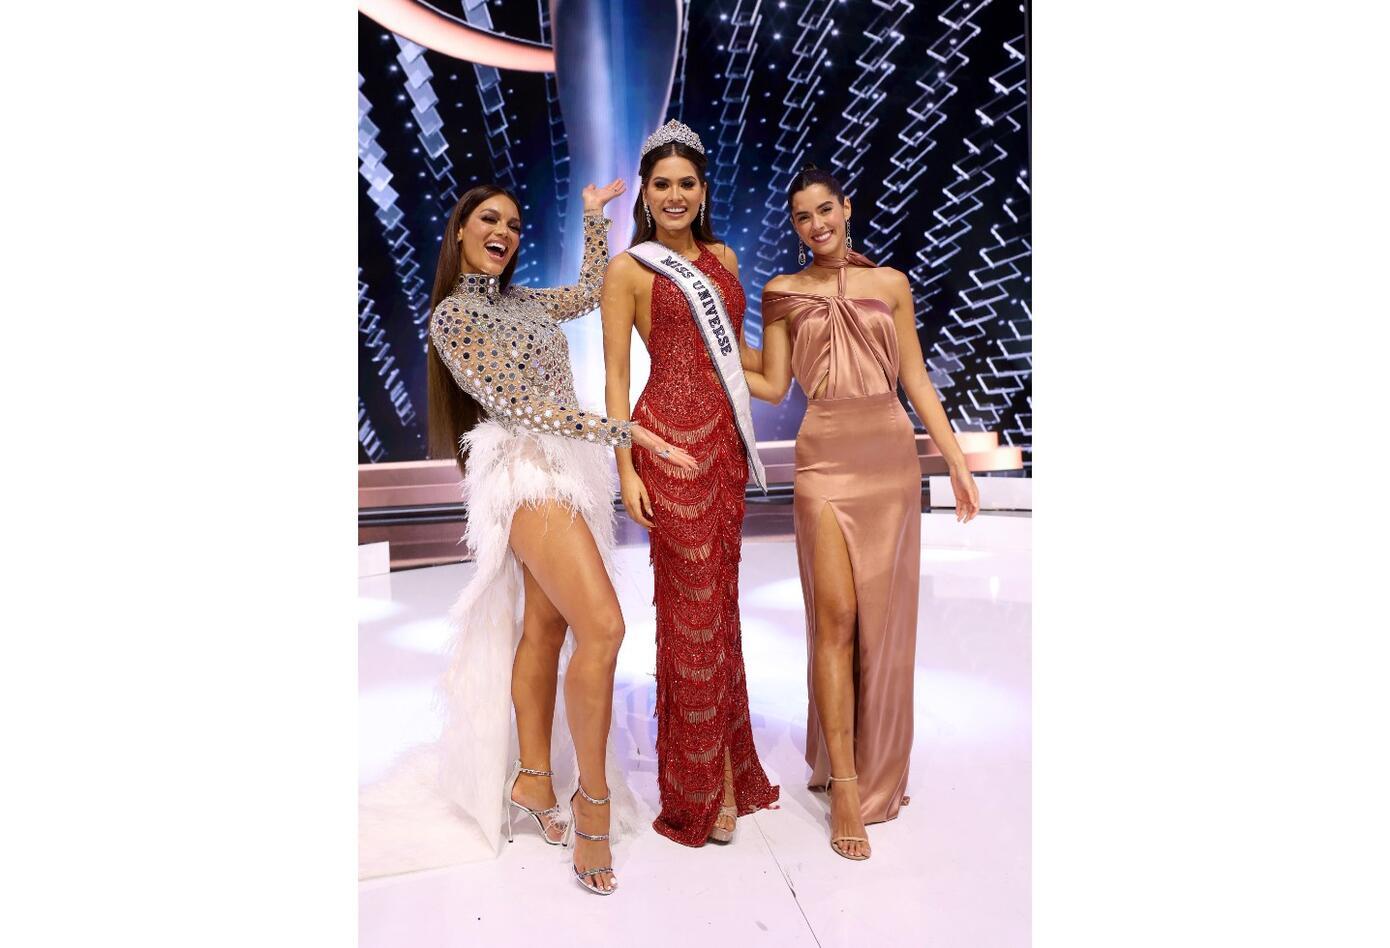 Andrea Meza, Miss Universo 2020 junto a Paulina Vega